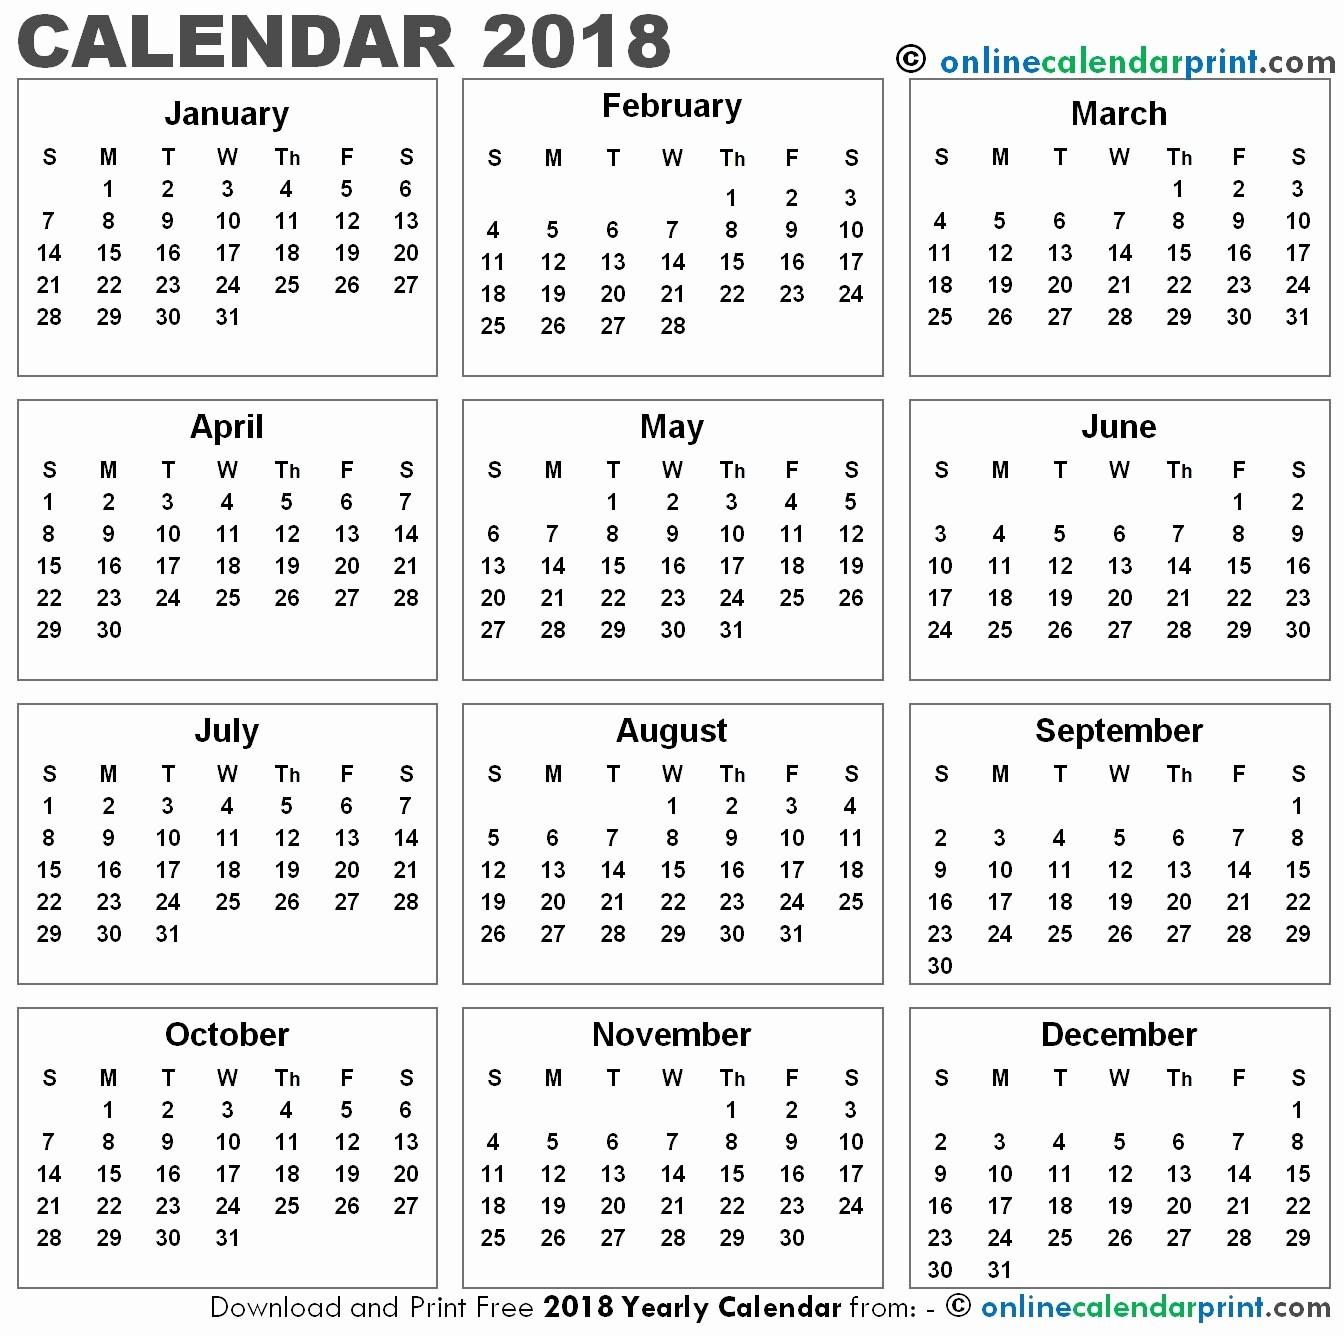 12 Month Printable Calendar 2018 Unique 12 Month Printable Calendar 2018 One Page – Template